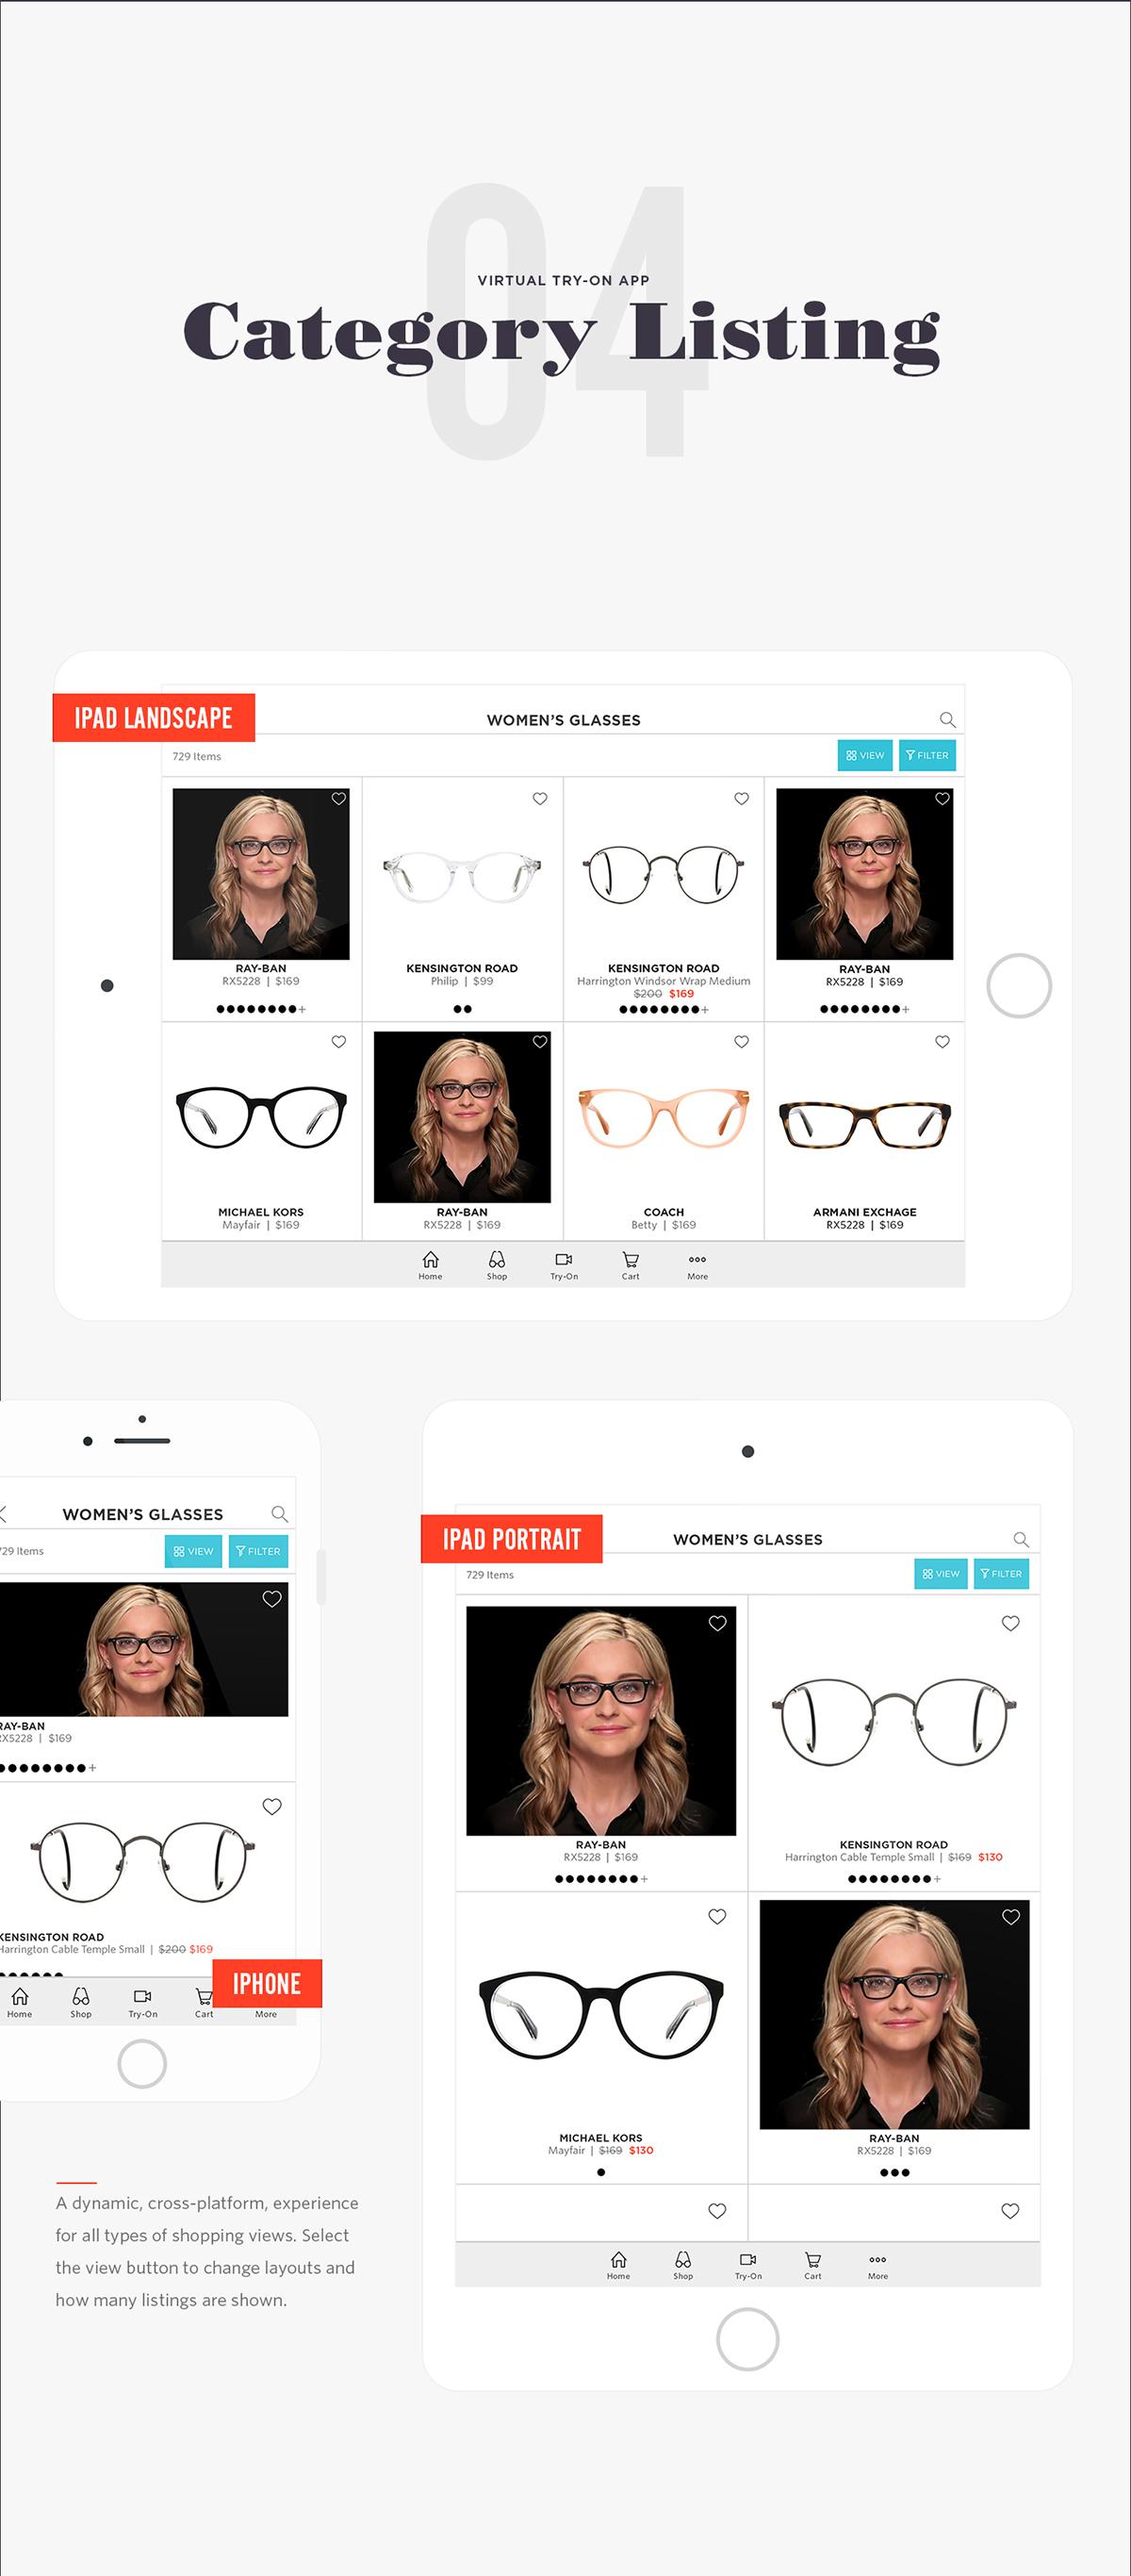 ios,app,virtual try-on,glasses,iphone,iPad